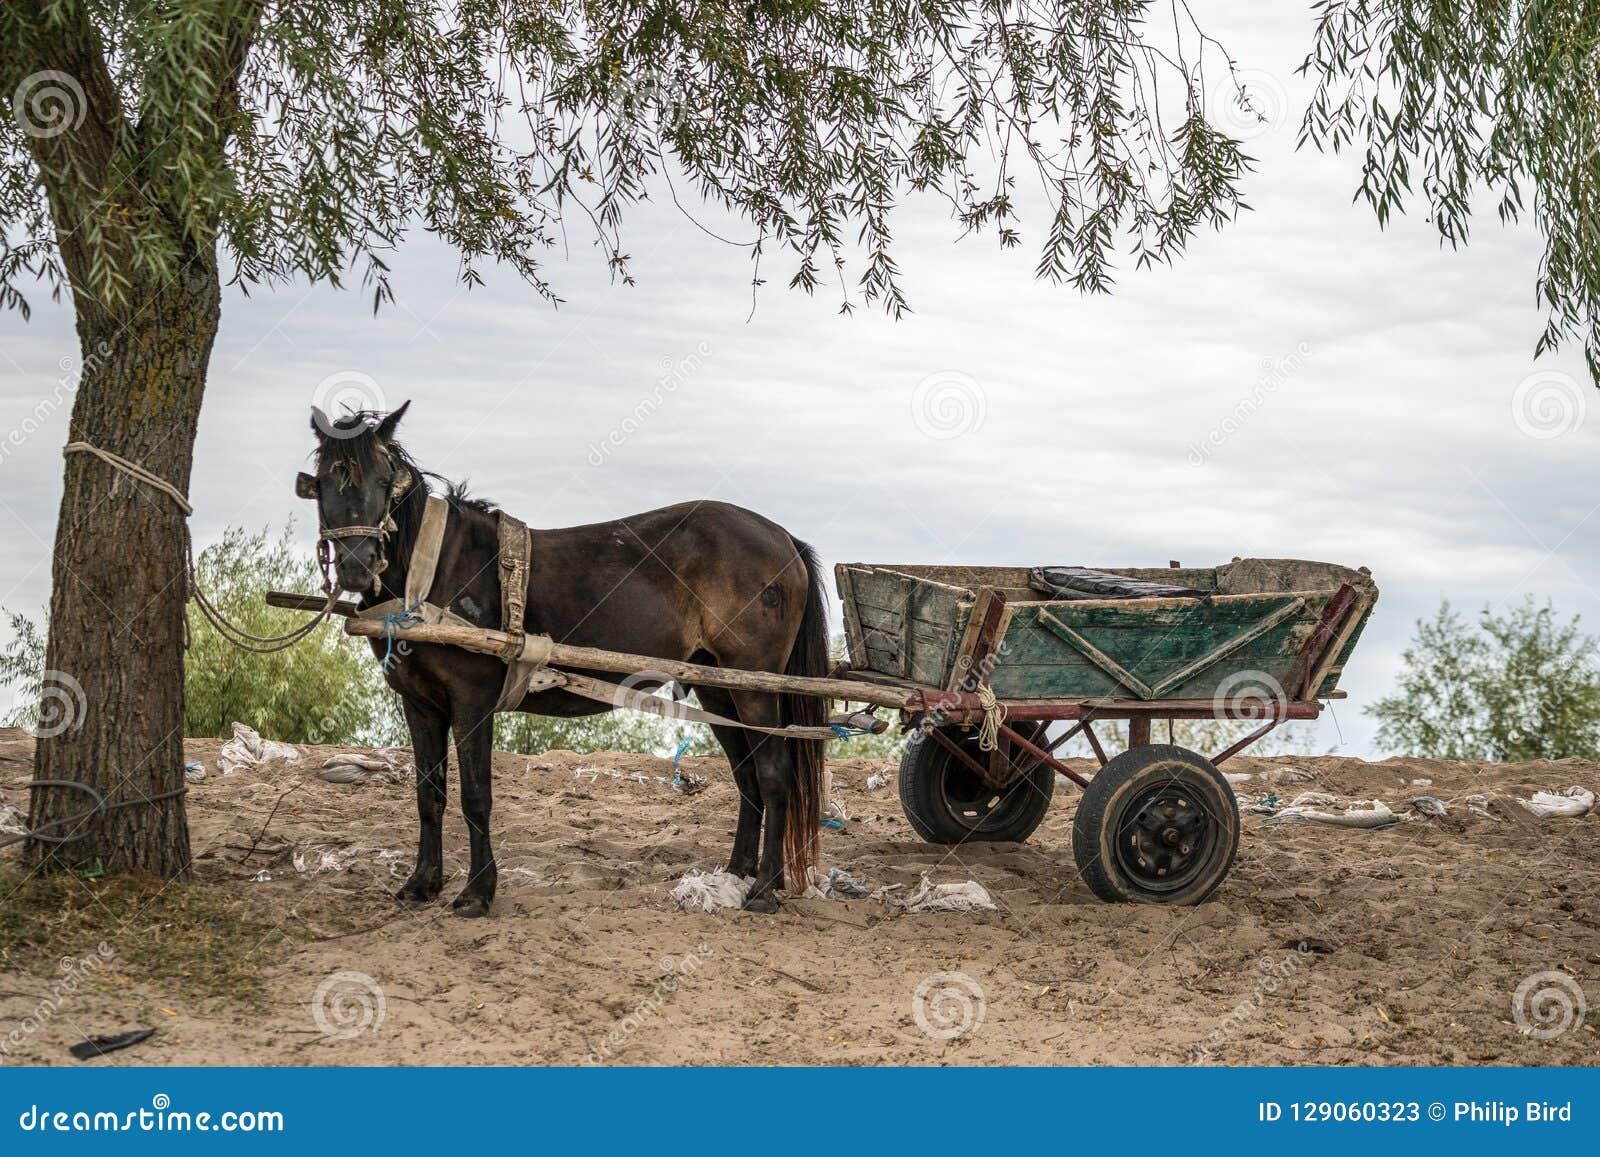 SULINA, DANUBE DELTA/ROMANIA - SEPTEMBER 23 : Horse and cart in